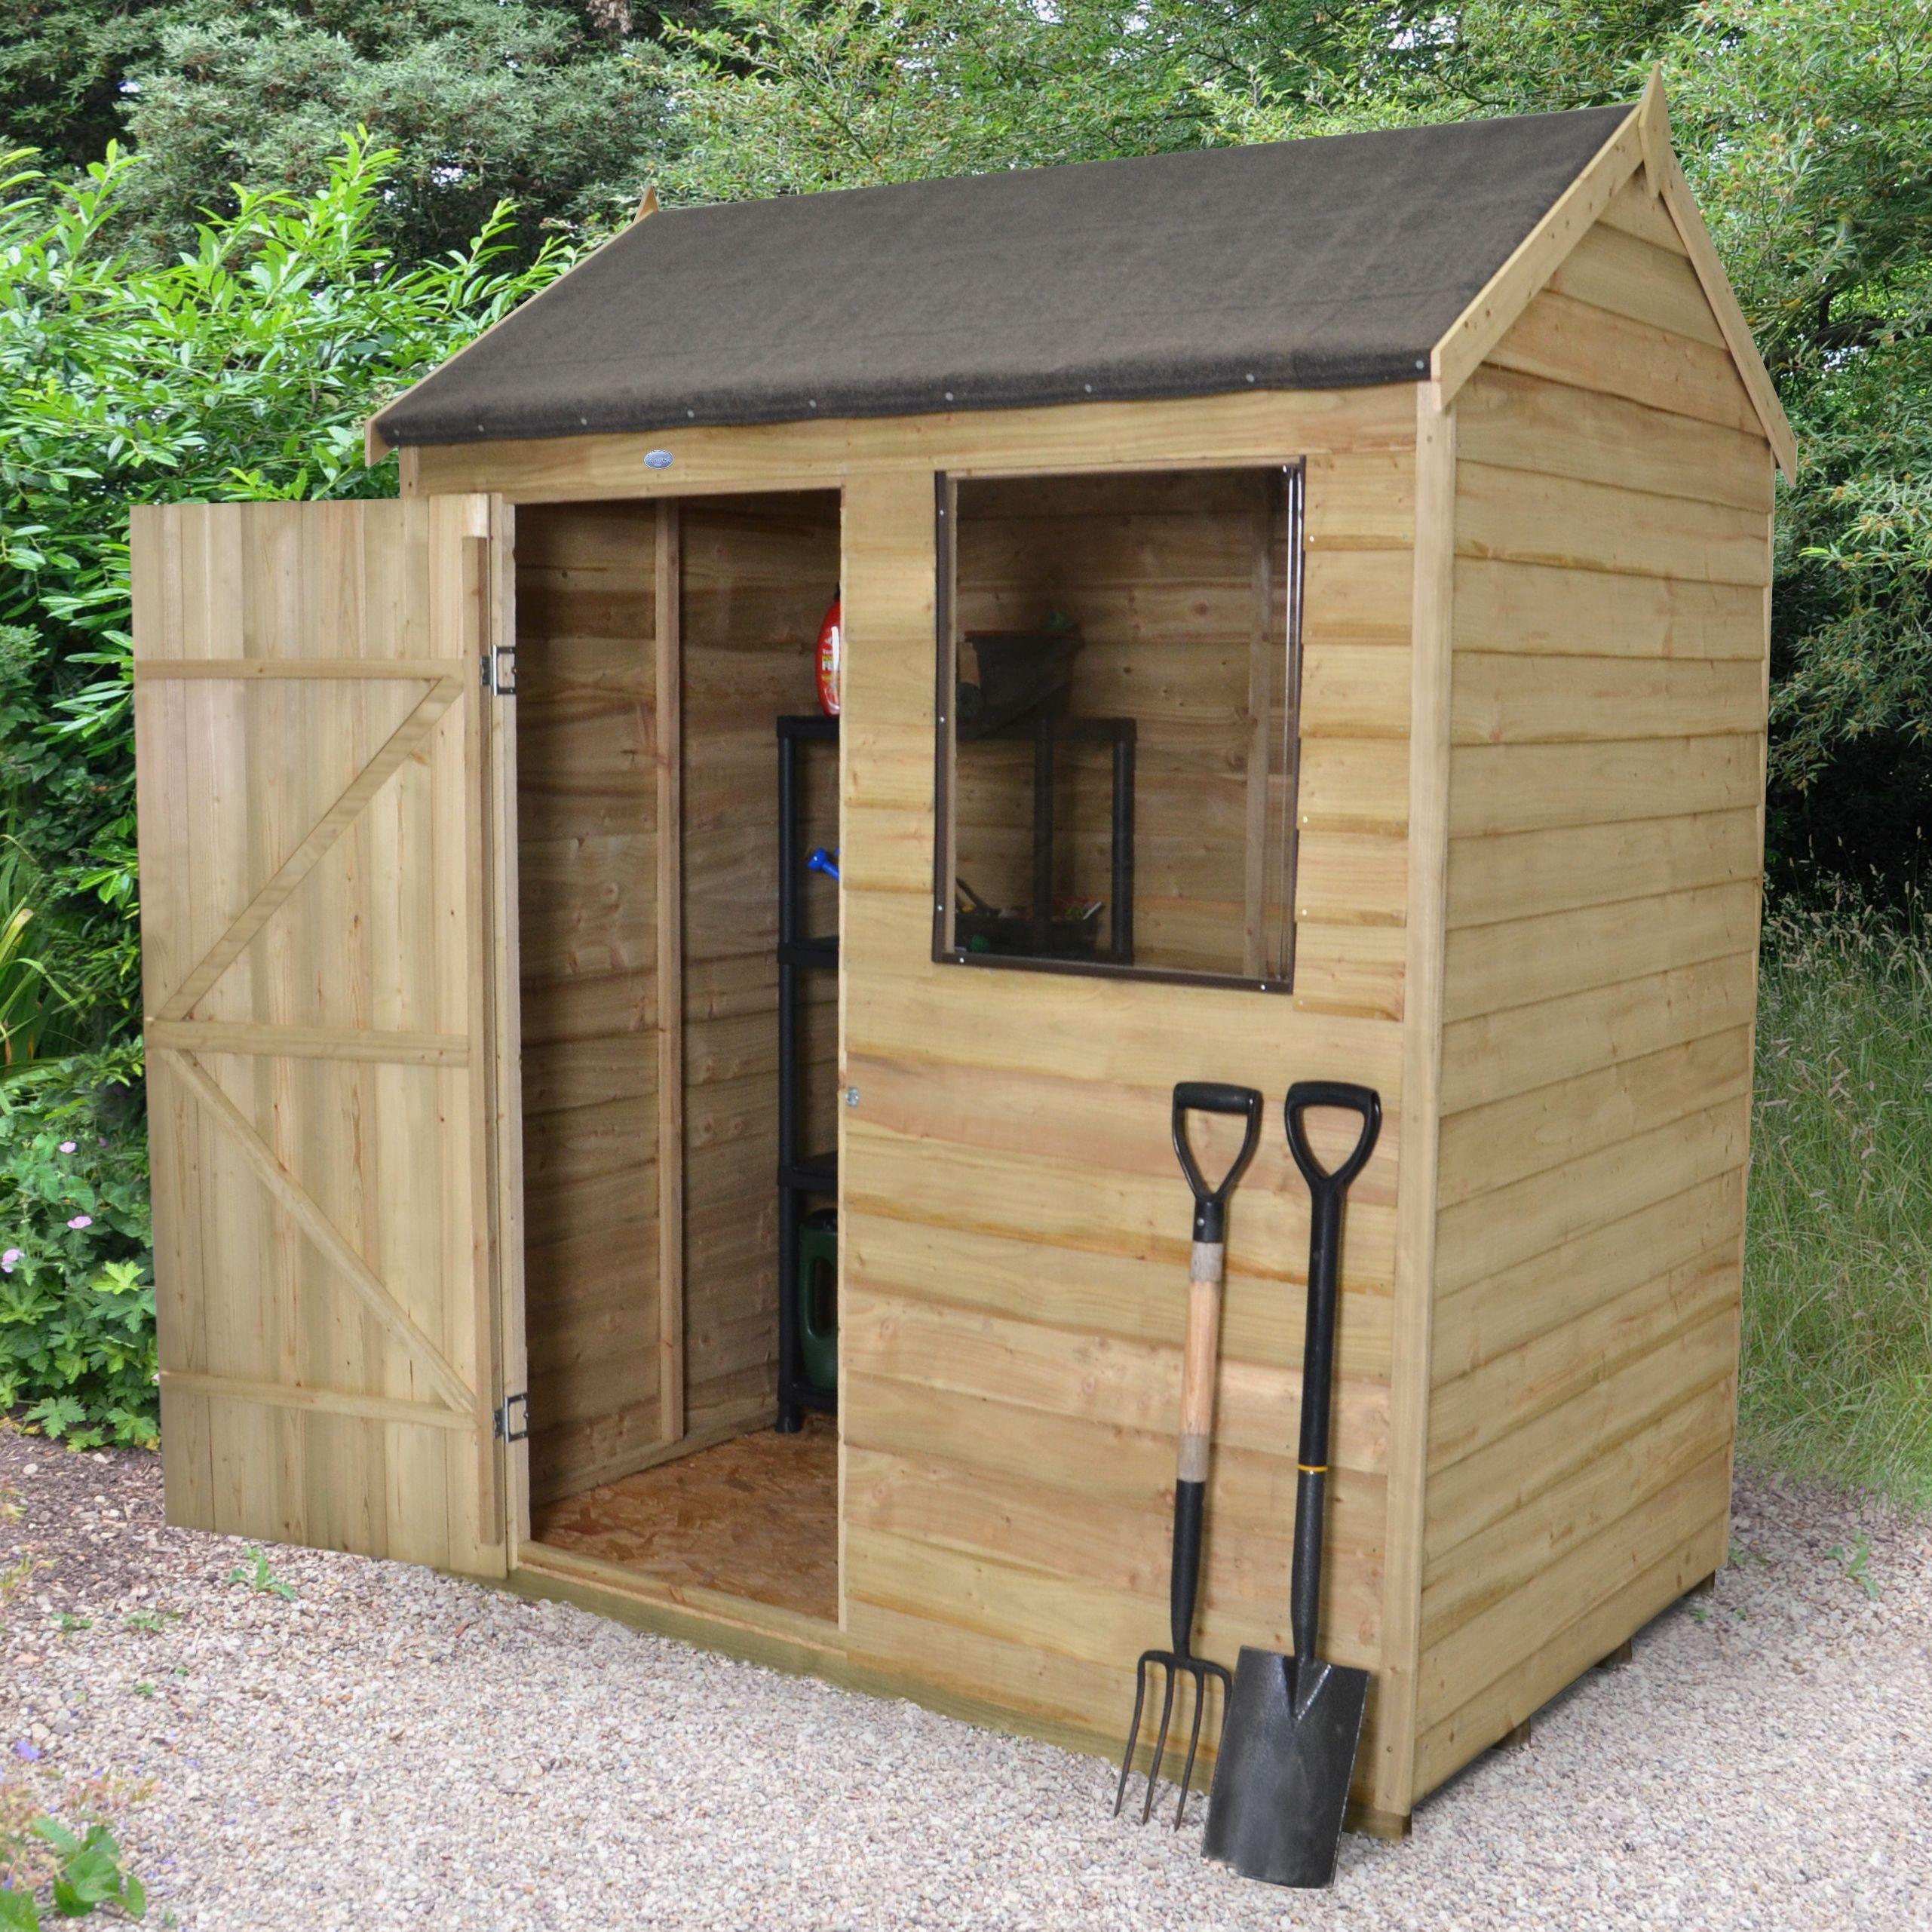 6x4 reverse apex overlap wooden shed - Garden Sheds B Q